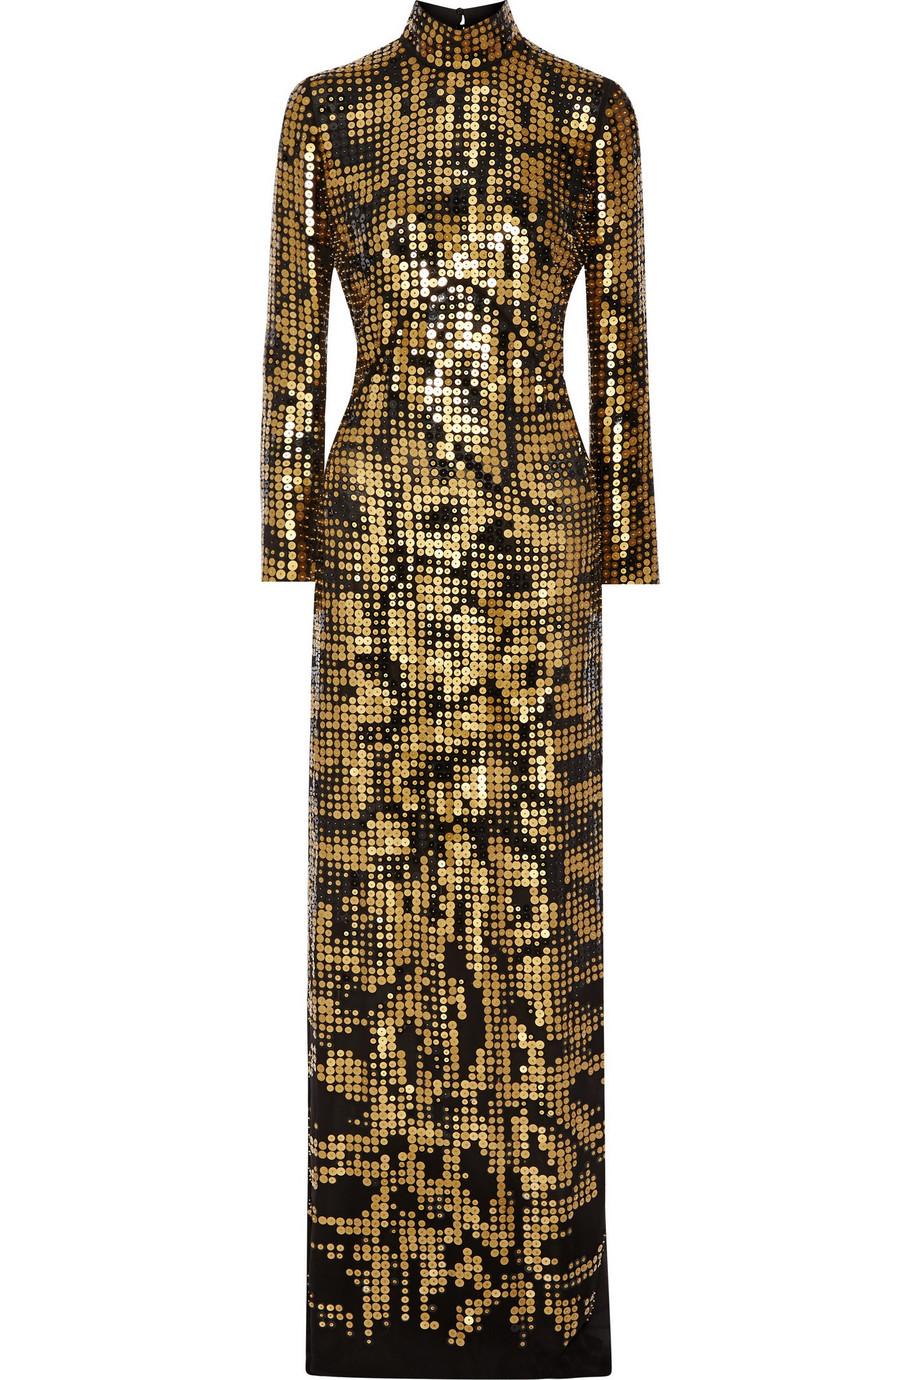 Roberto Cavalli Dresses Size Chart Roberto Cavalli Embellished